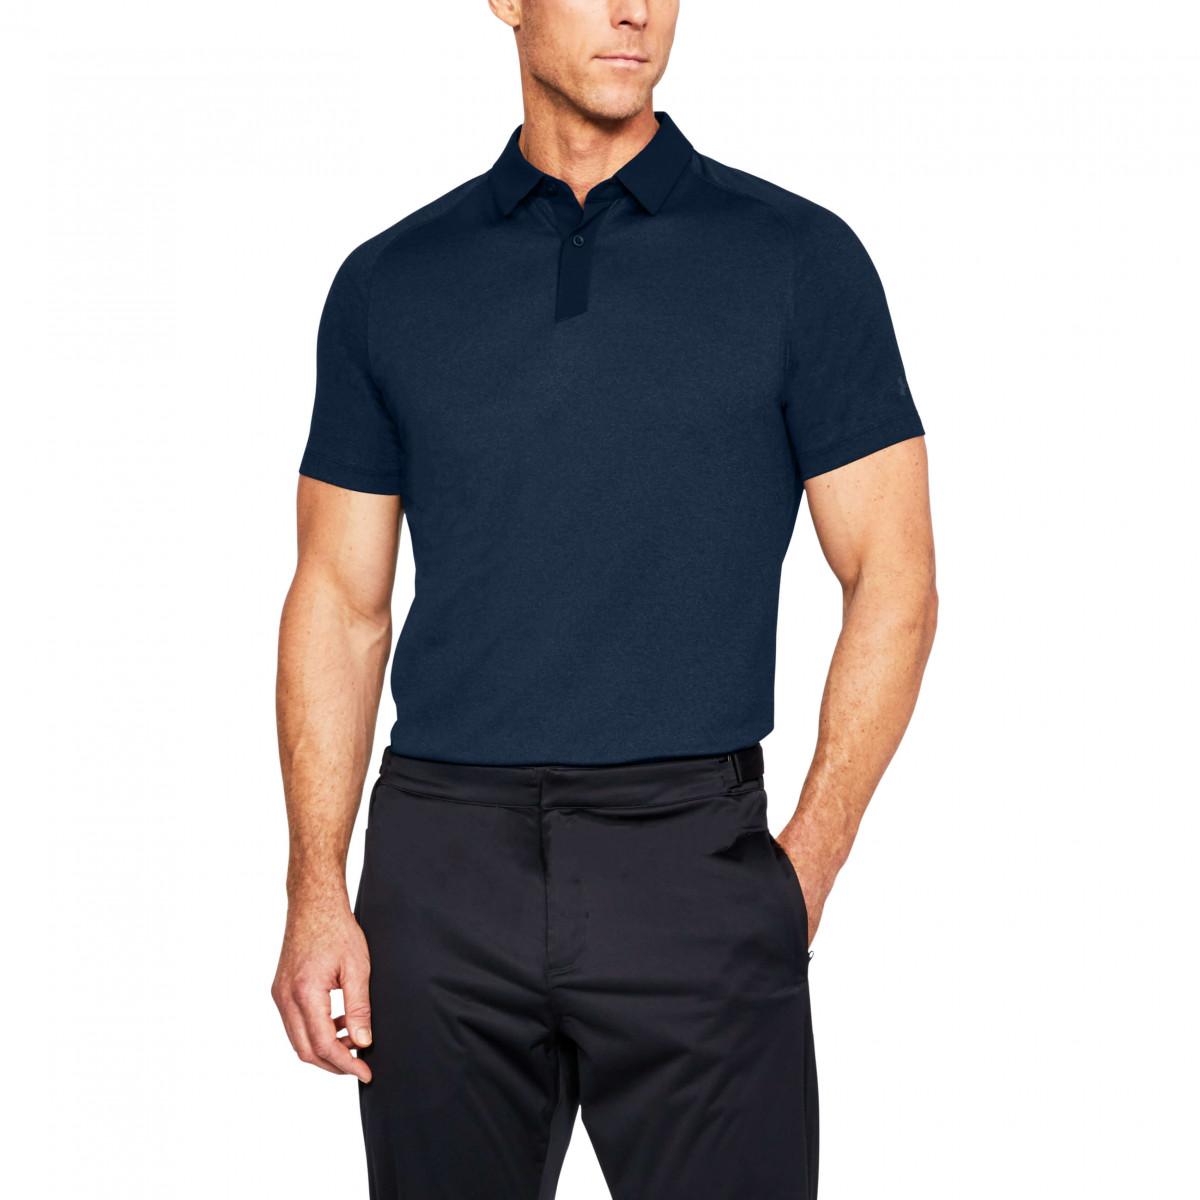 c6155a1d Under Armour Mens Threadborne Tour Polo Shirt - Golf Polo Shirts ...